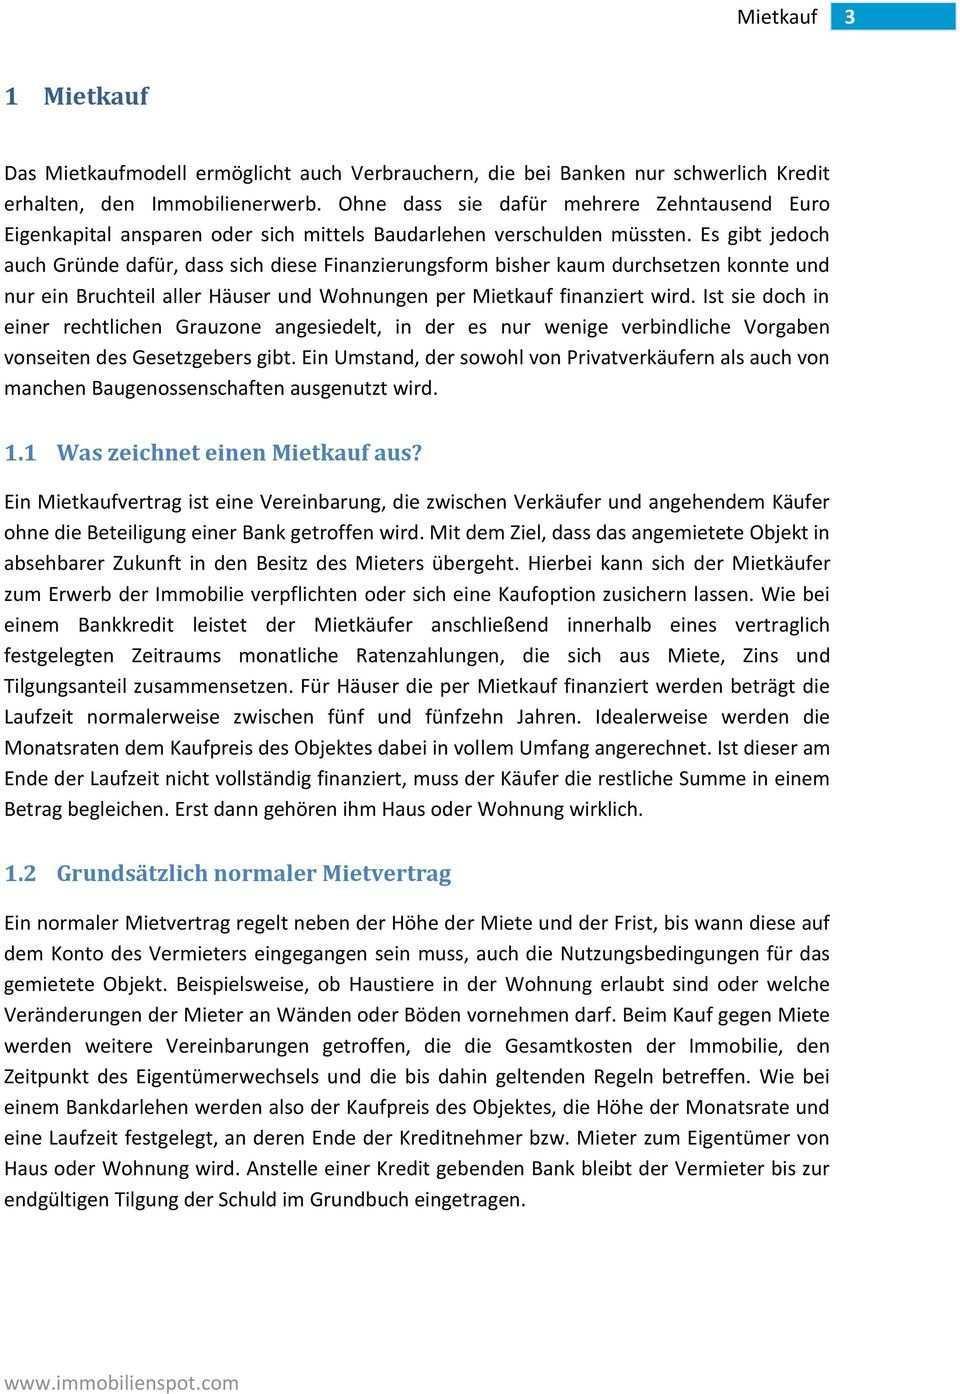 E Book Ratgeber Mietkauf Pdf Free Download